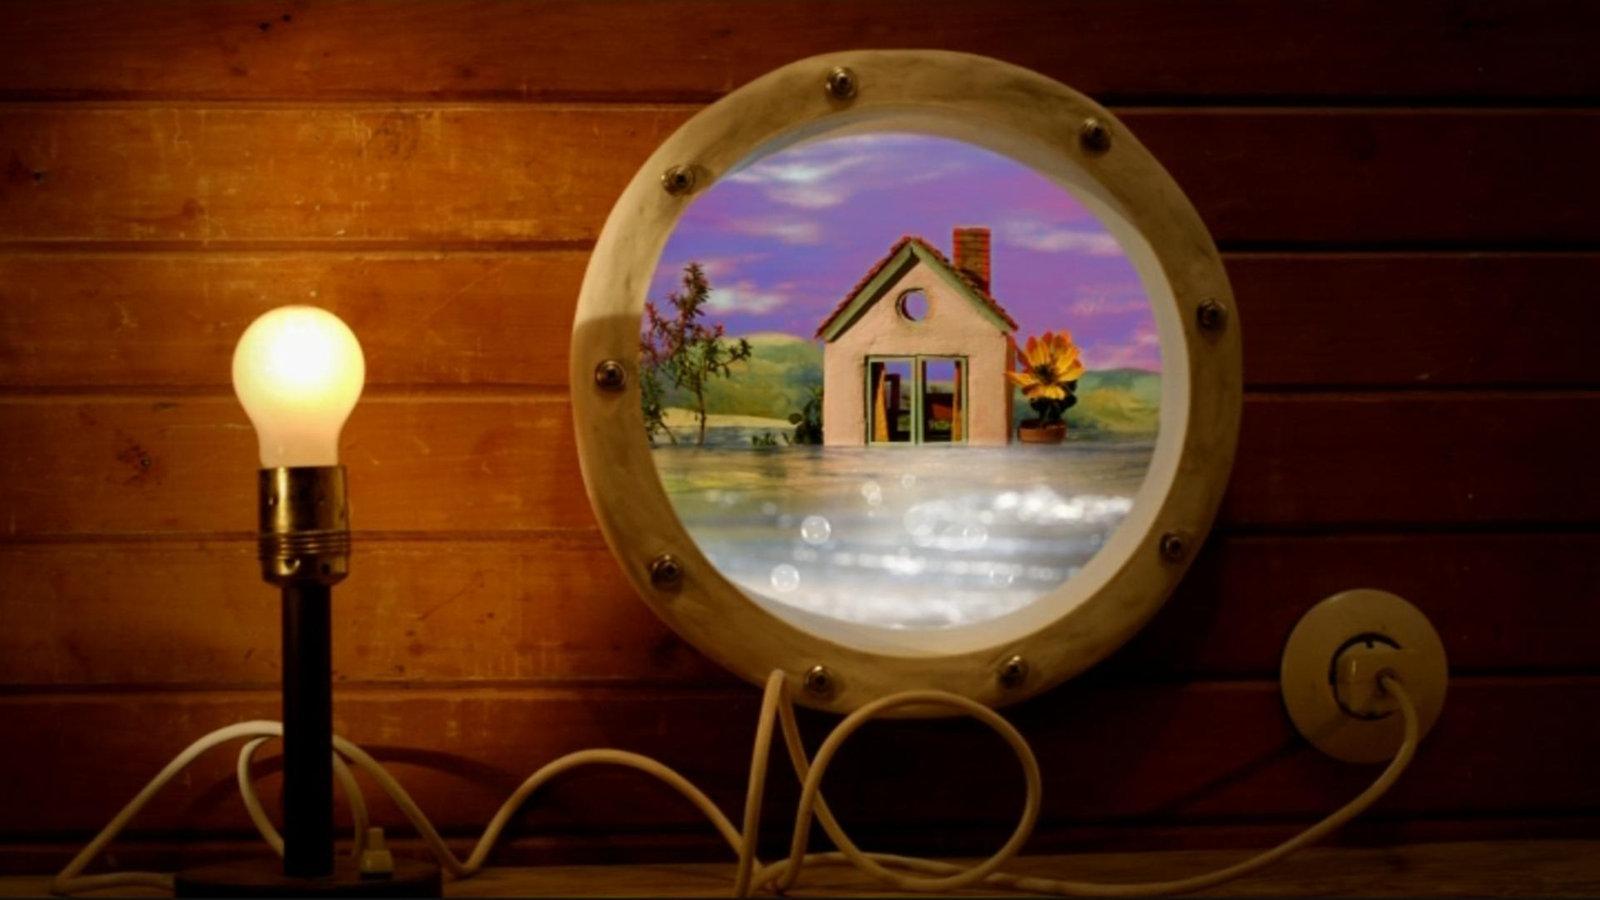 sachgeschichte strom sparen kinder. Black Bedroom Furniture Sets. Home Design Ideas